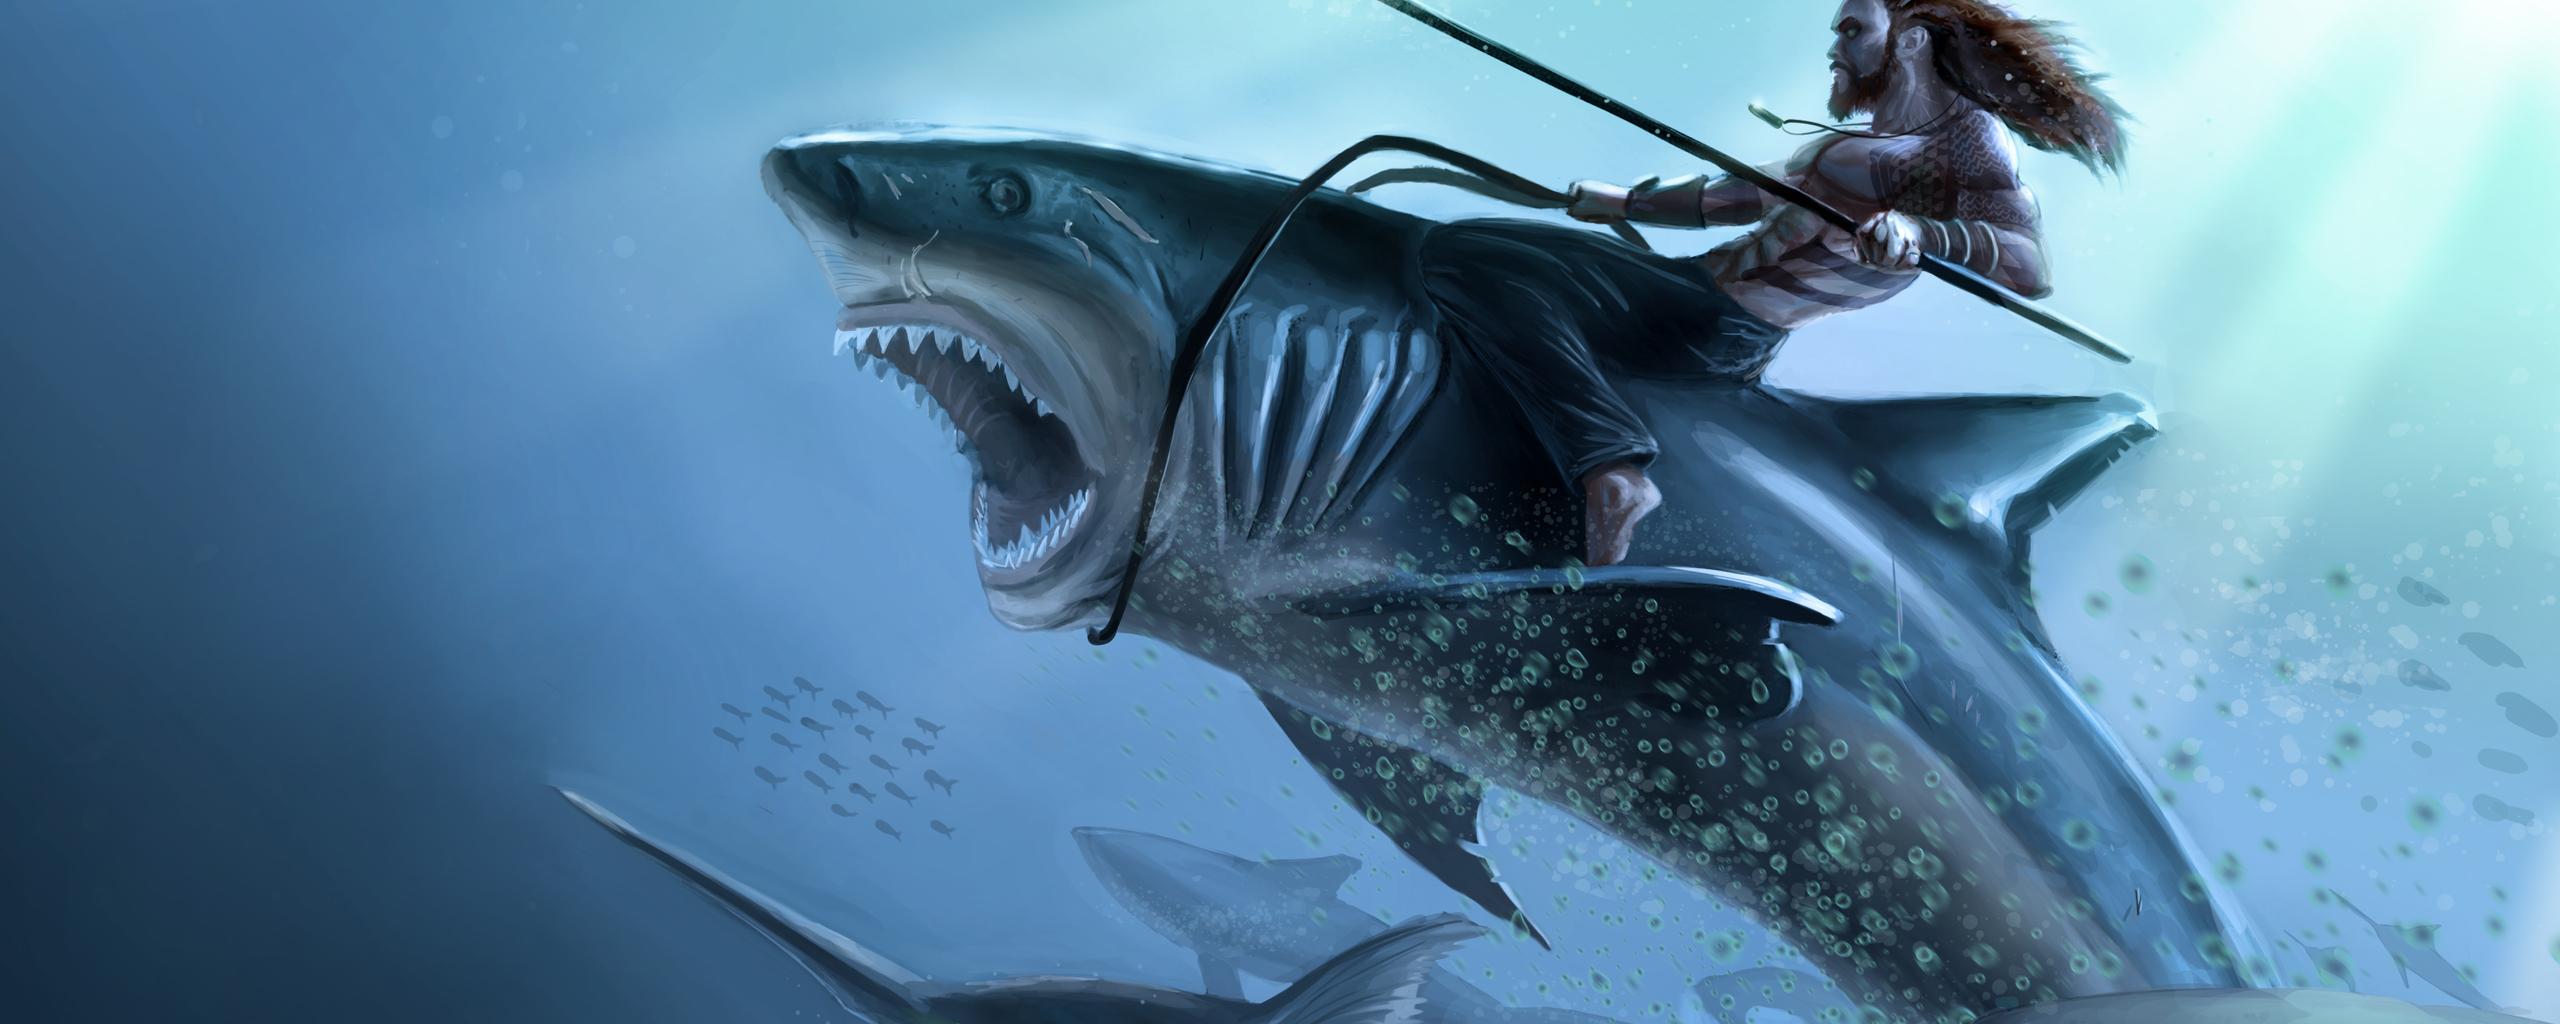 aquaman-riding-on-shark-art-4k-2e.jpg